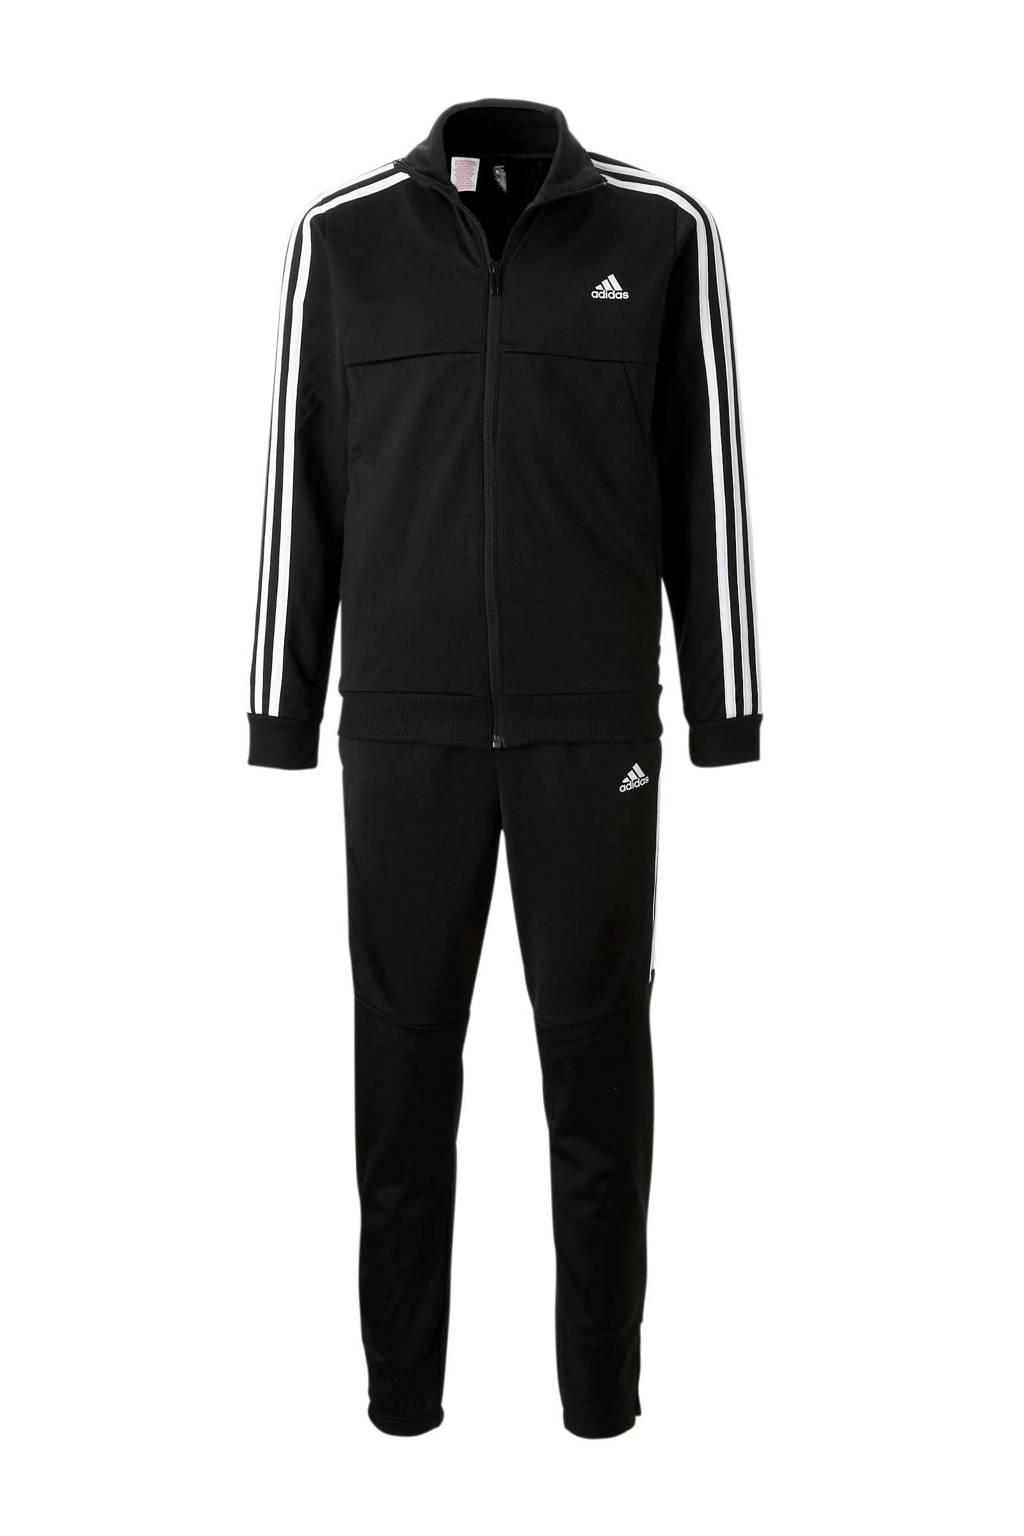 adidas   trainingspak zwart, Zwart